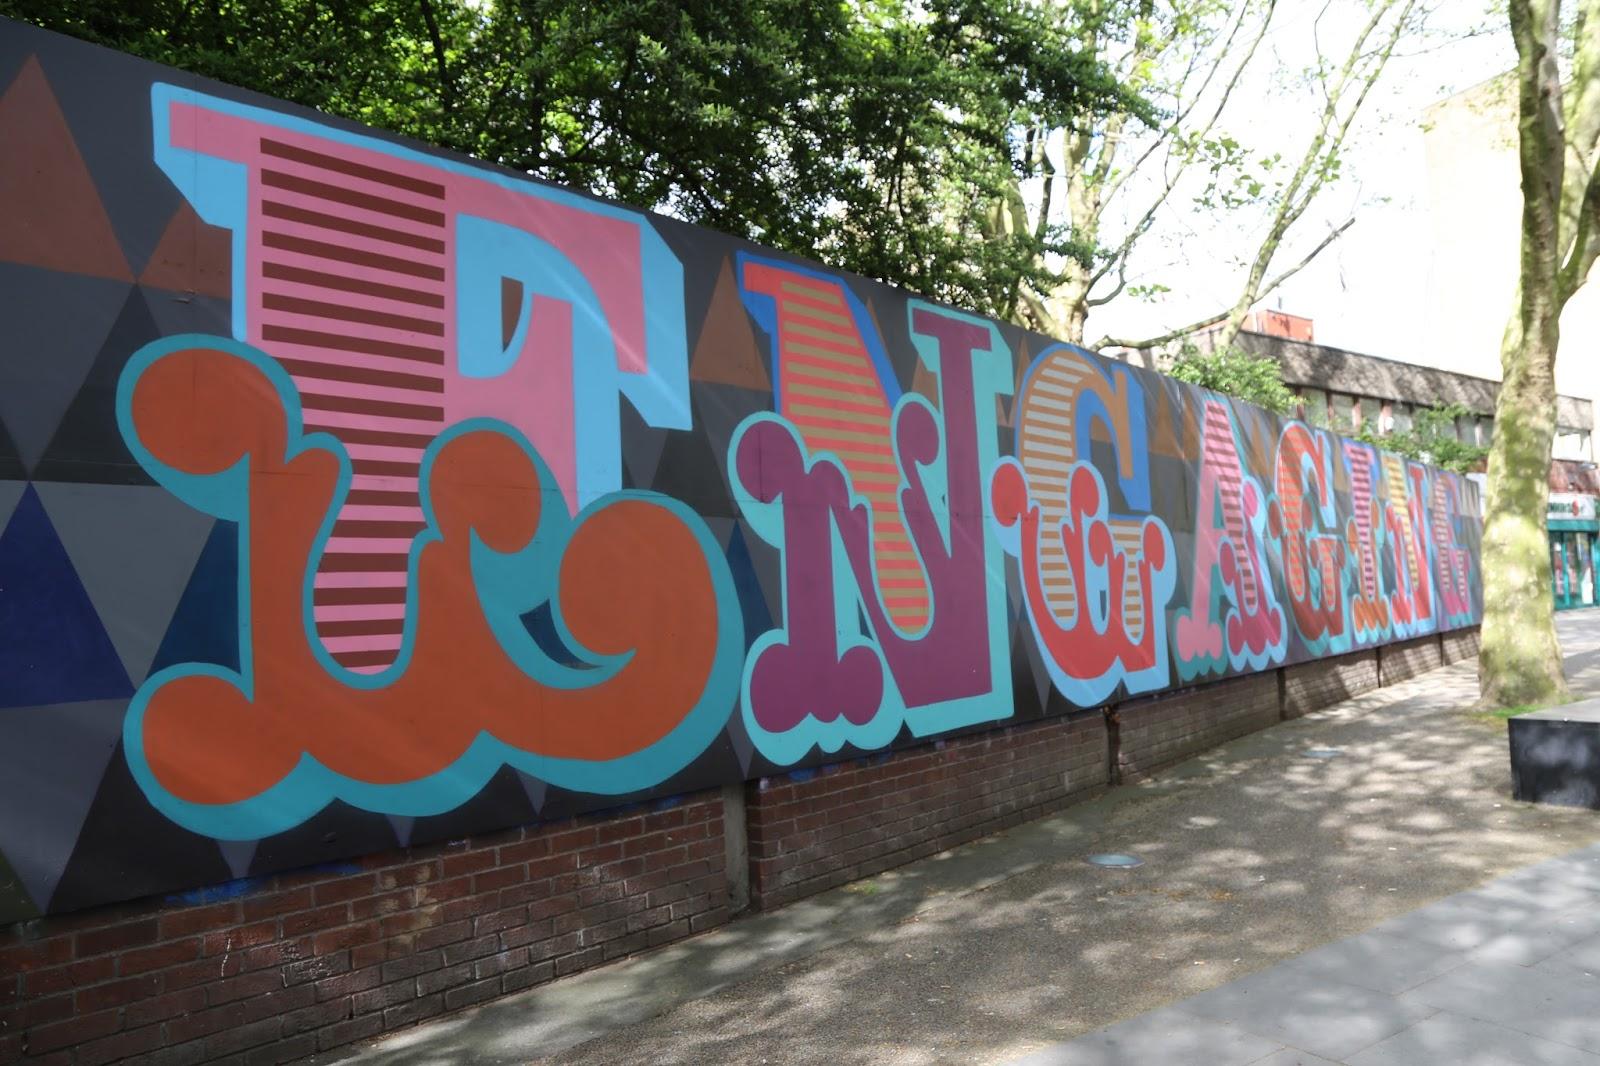 Brilliant Street Art Strassenkunst Graffiti Wandmalerei